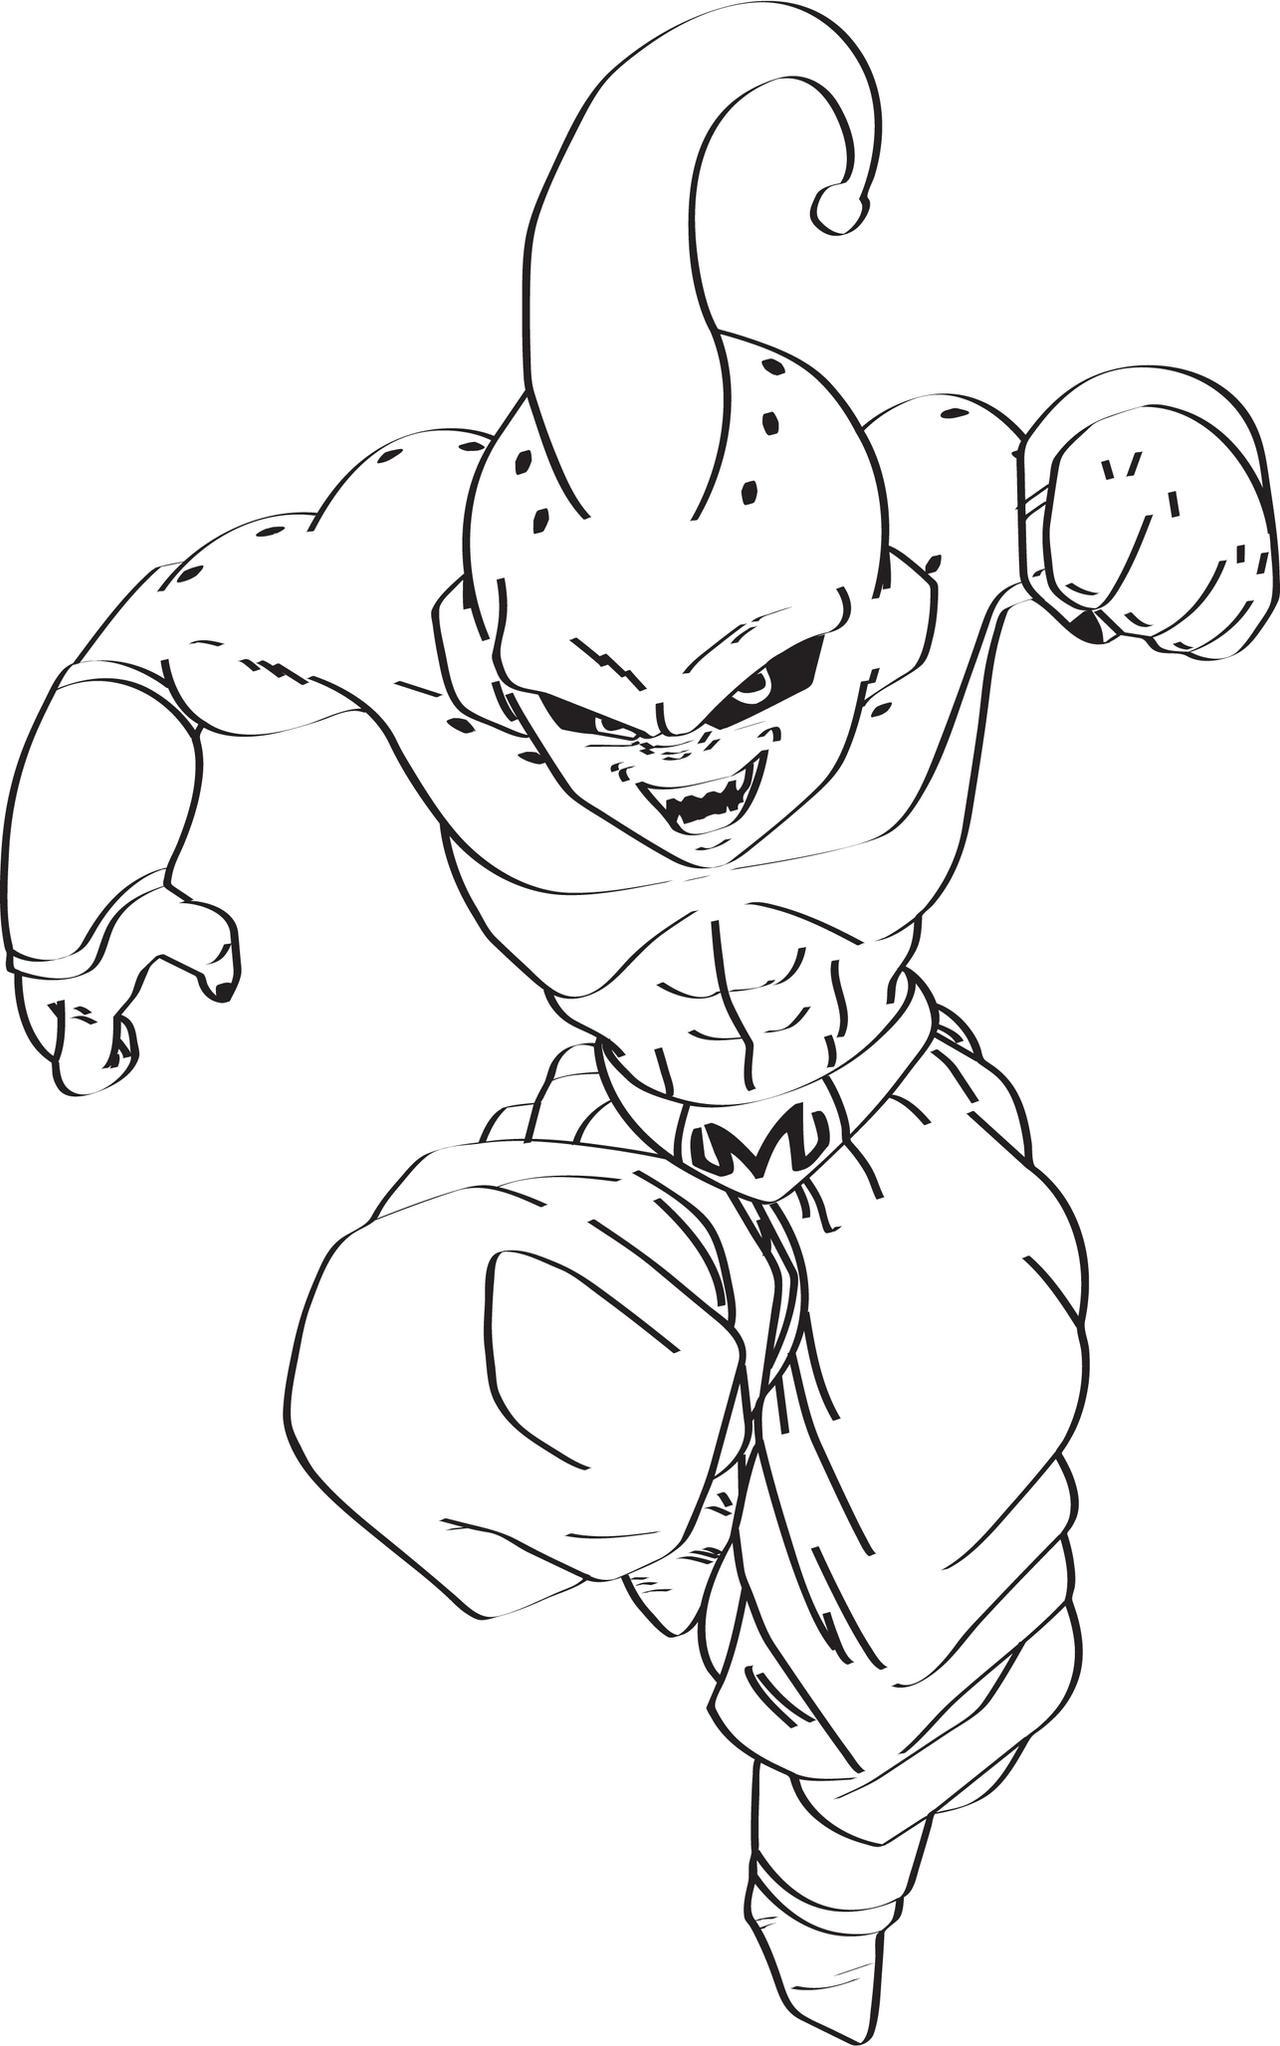 Majin Boo Dragon Ball Z Coloring